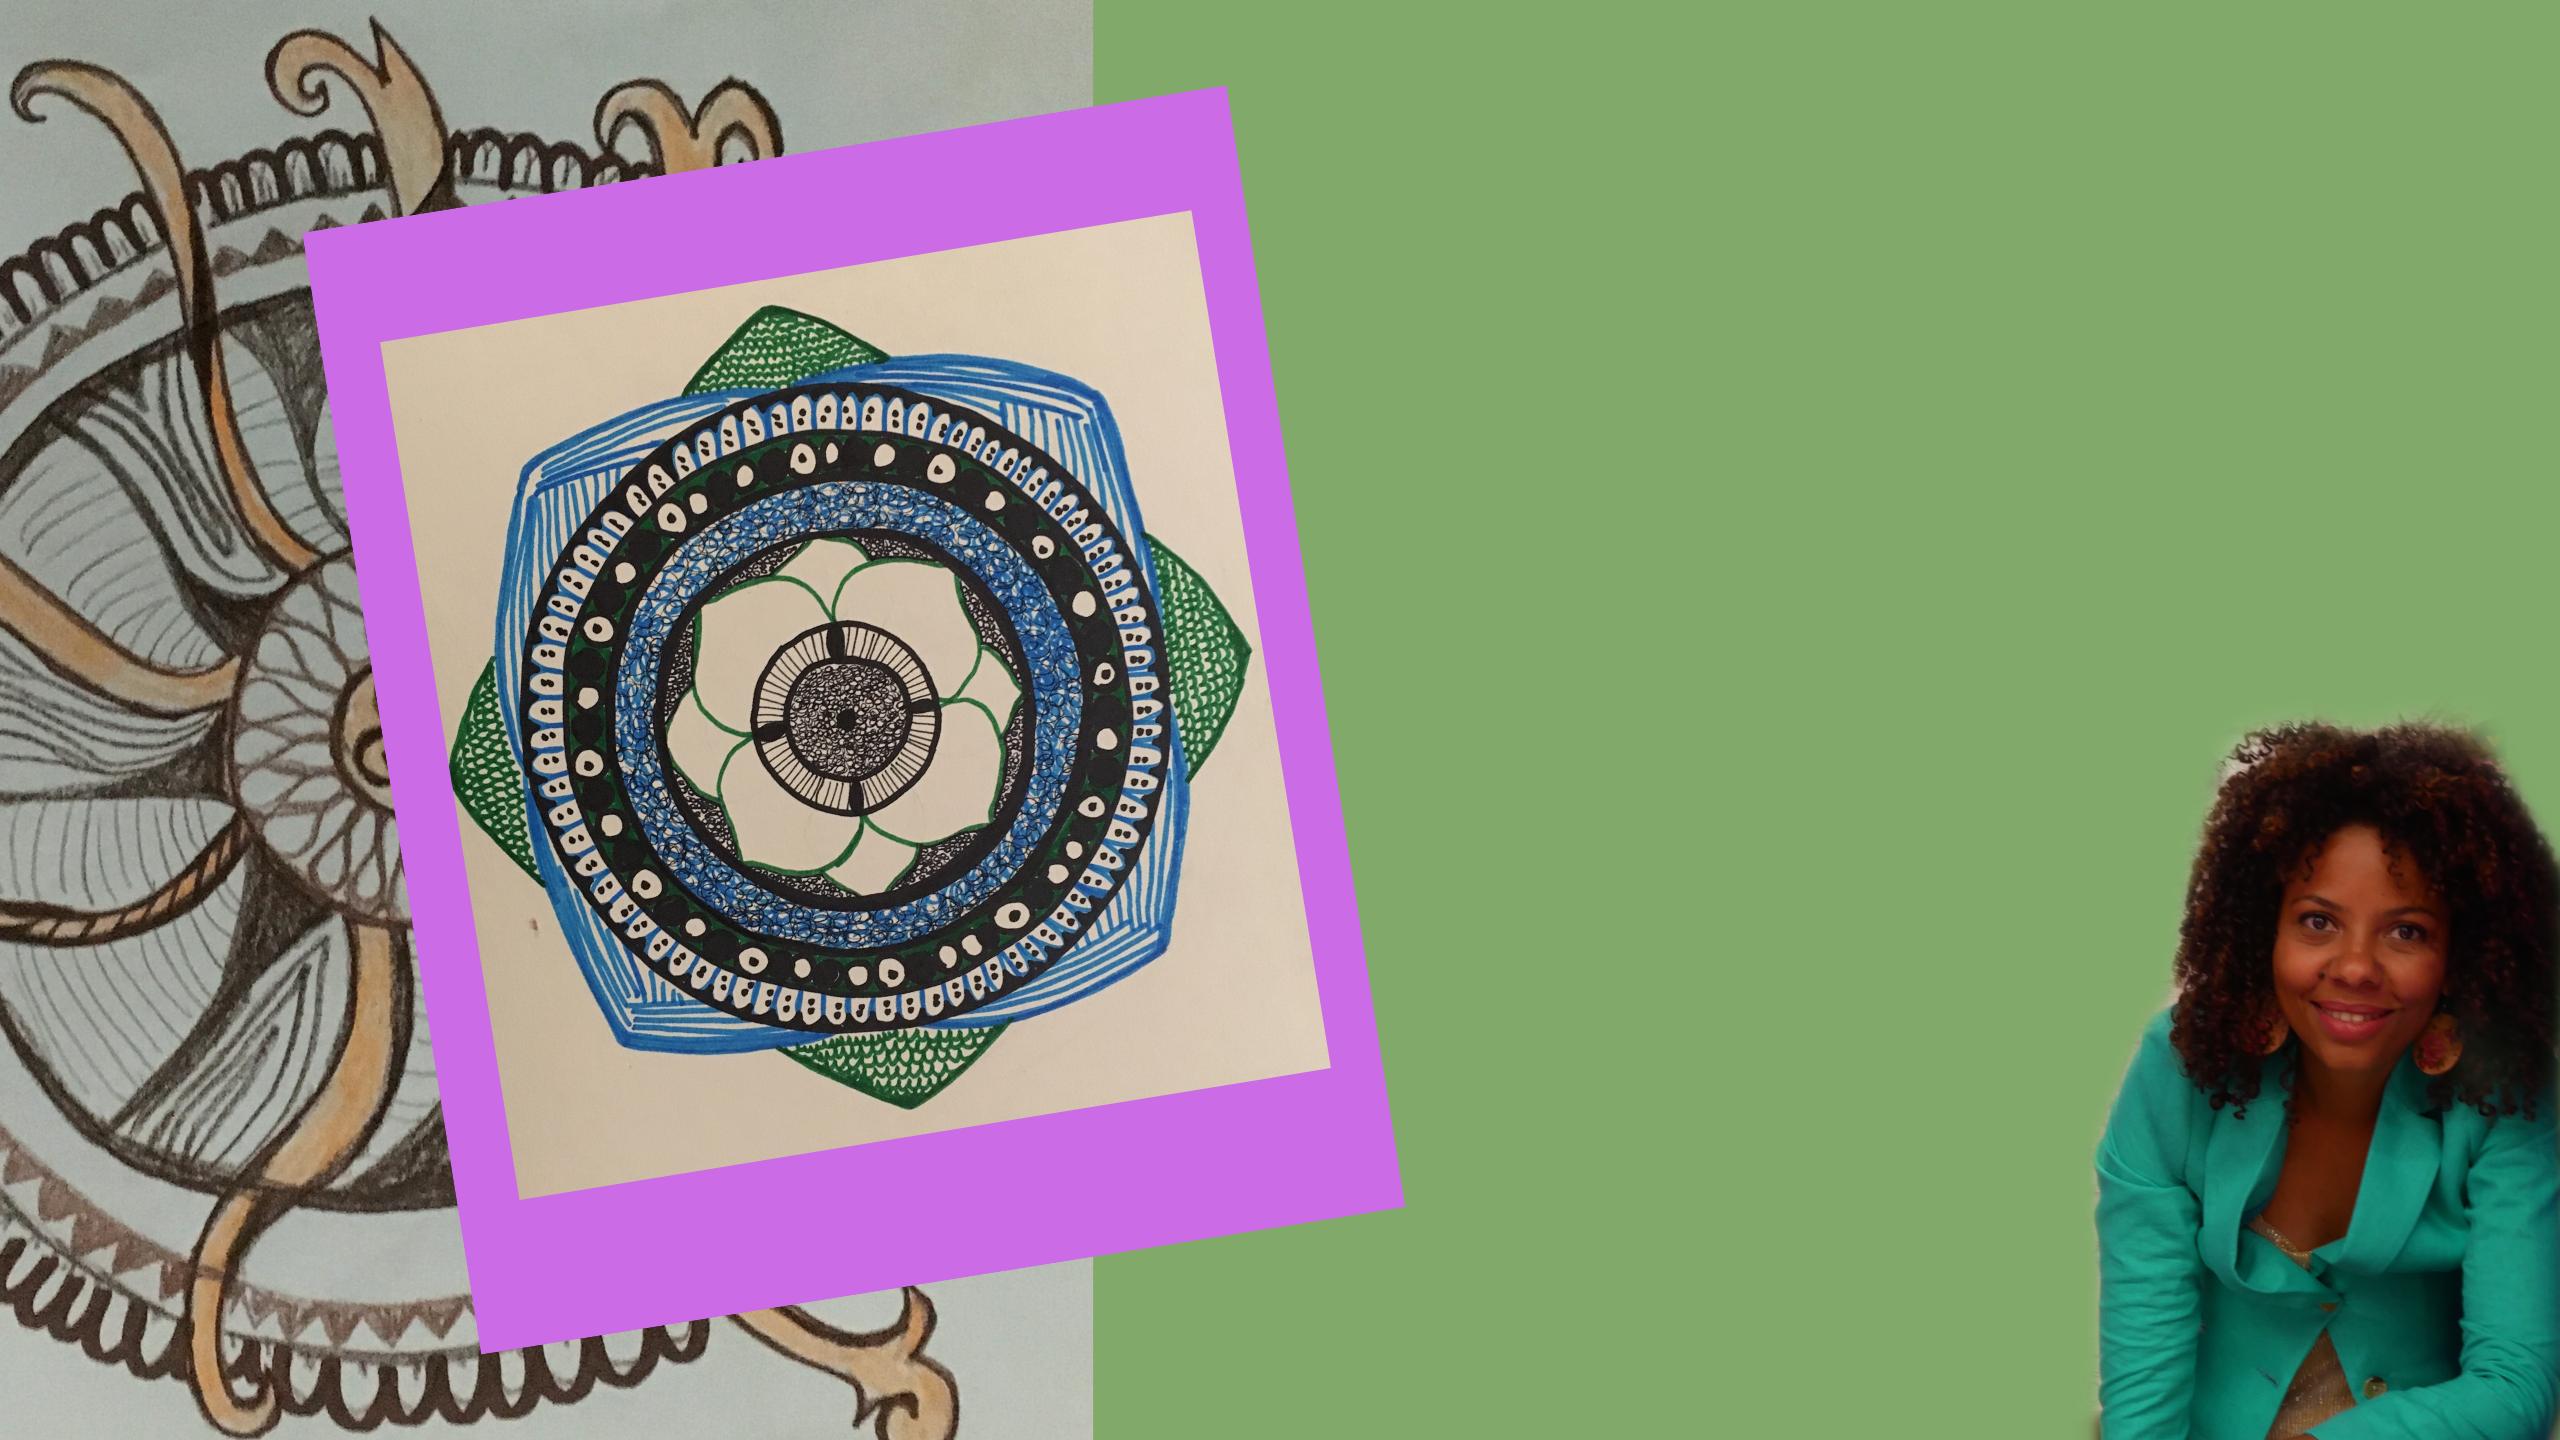 Mindfulness based Art Course: The Mindfulness Mandala Drawing Course